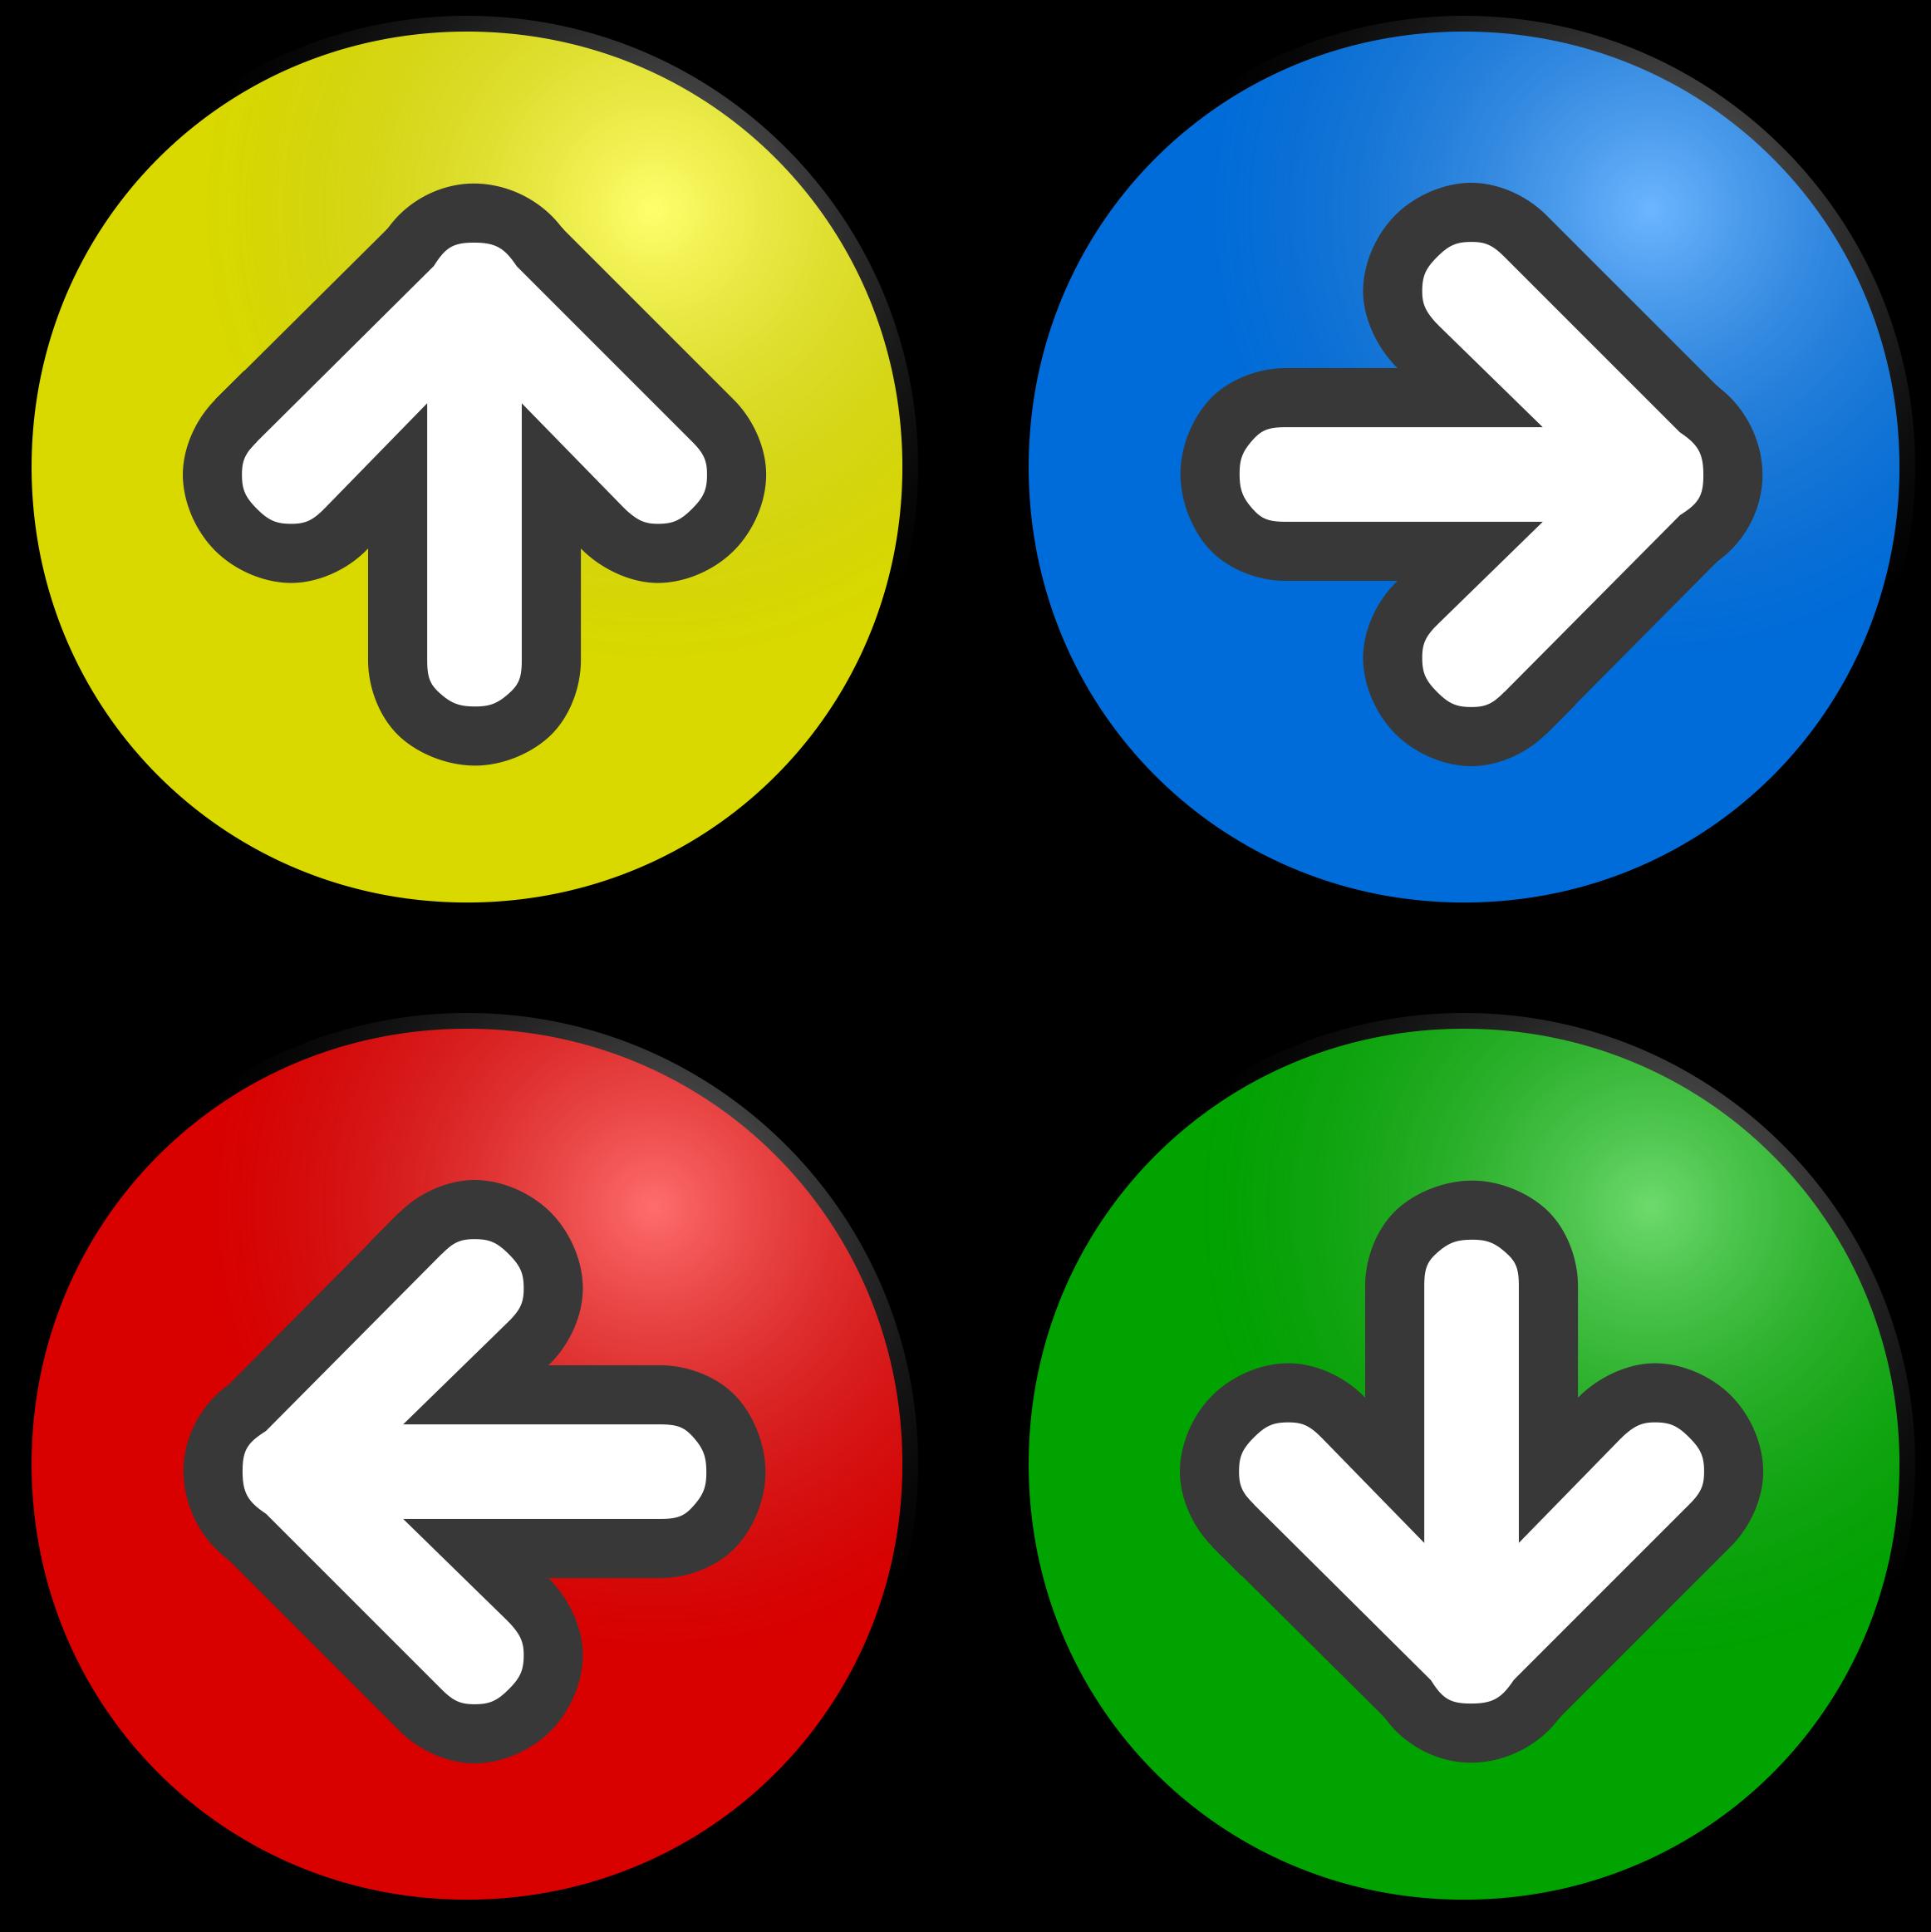 Children-s directional arrows clipart svg free download Free Direction Arrows Cliparts, Download Free Clip Art, Free Clip ... svg free download